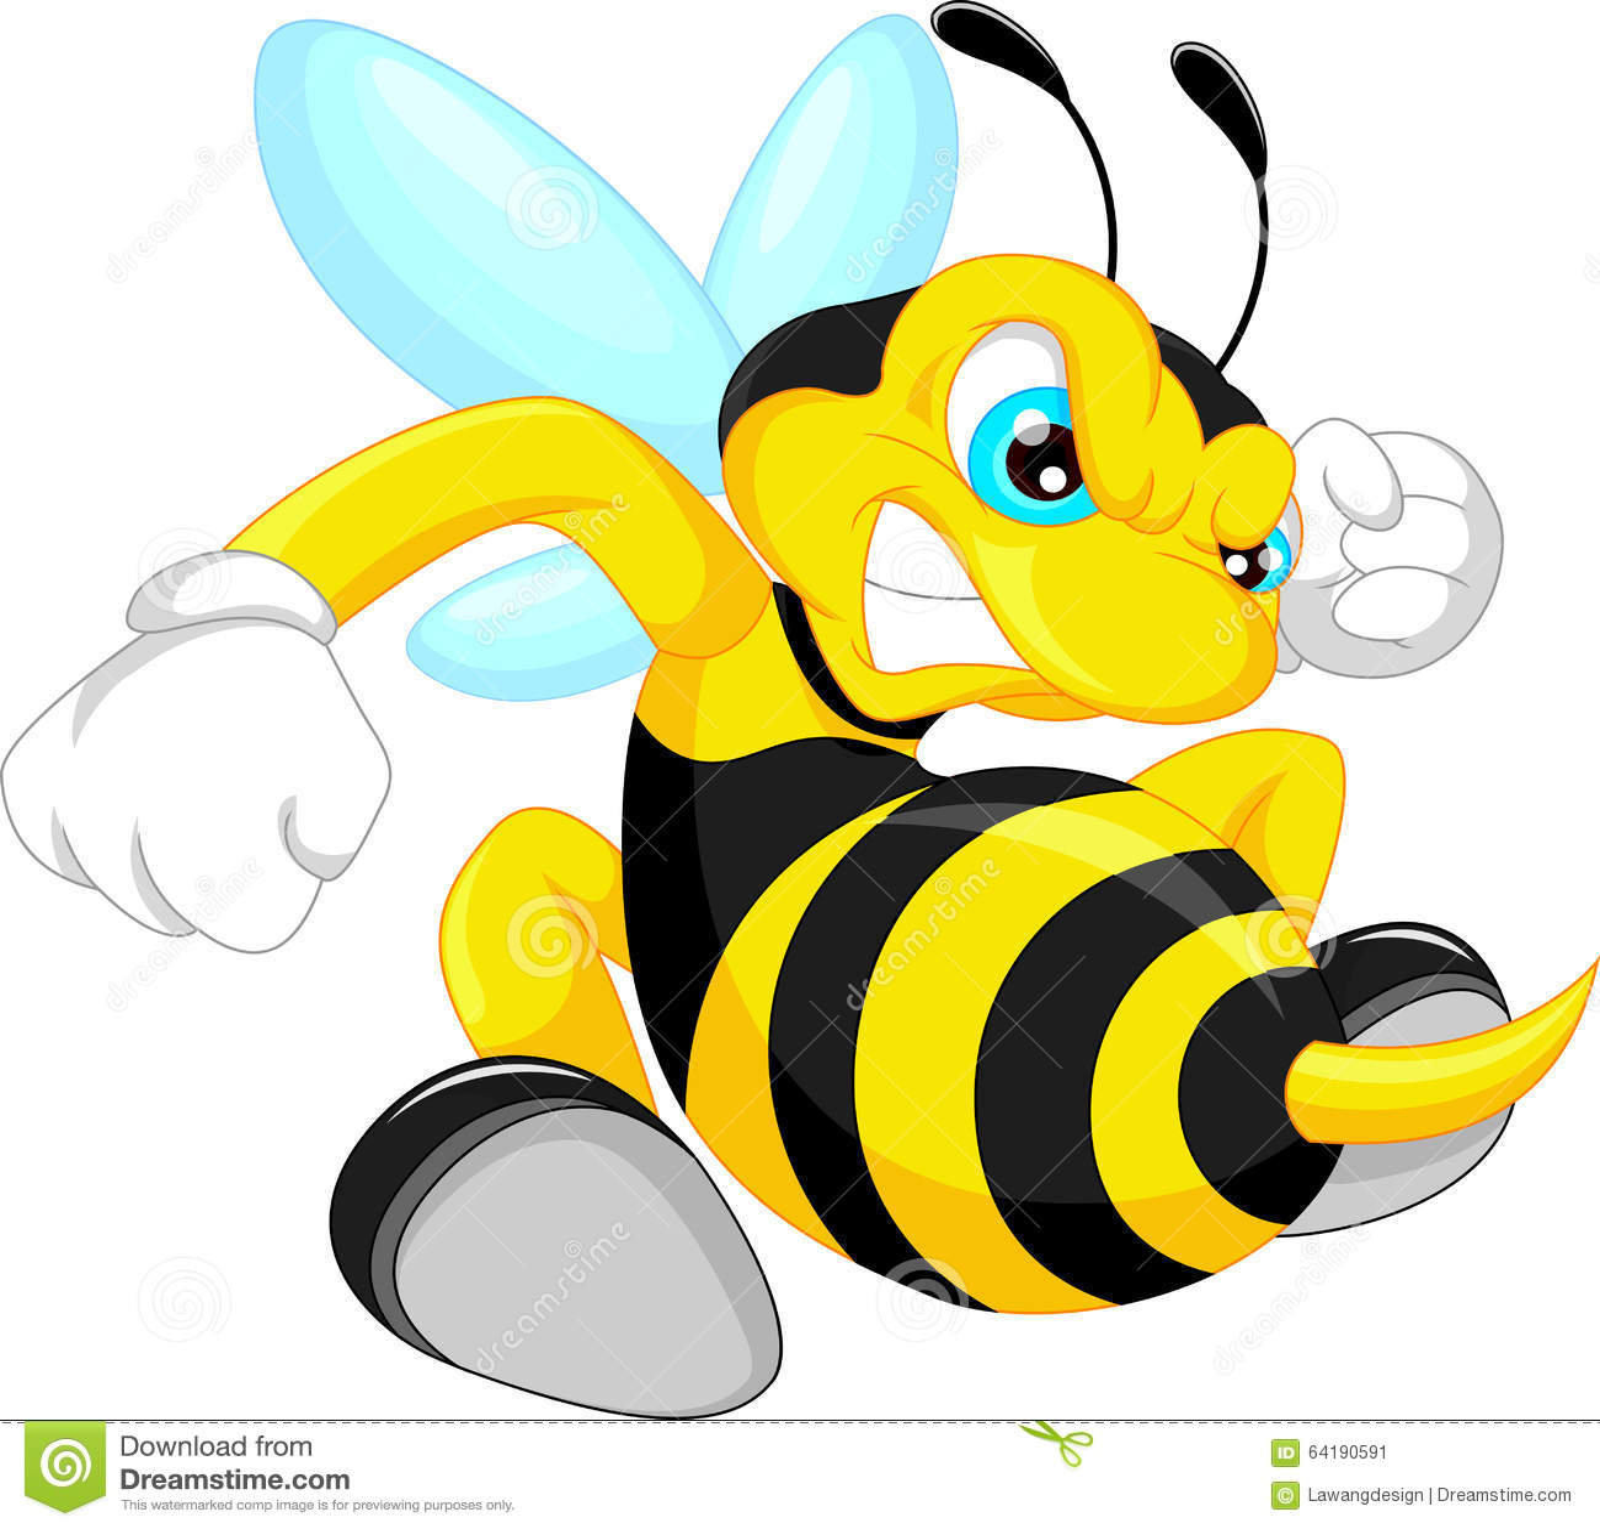 angry bumblebee cartoon - photo #4